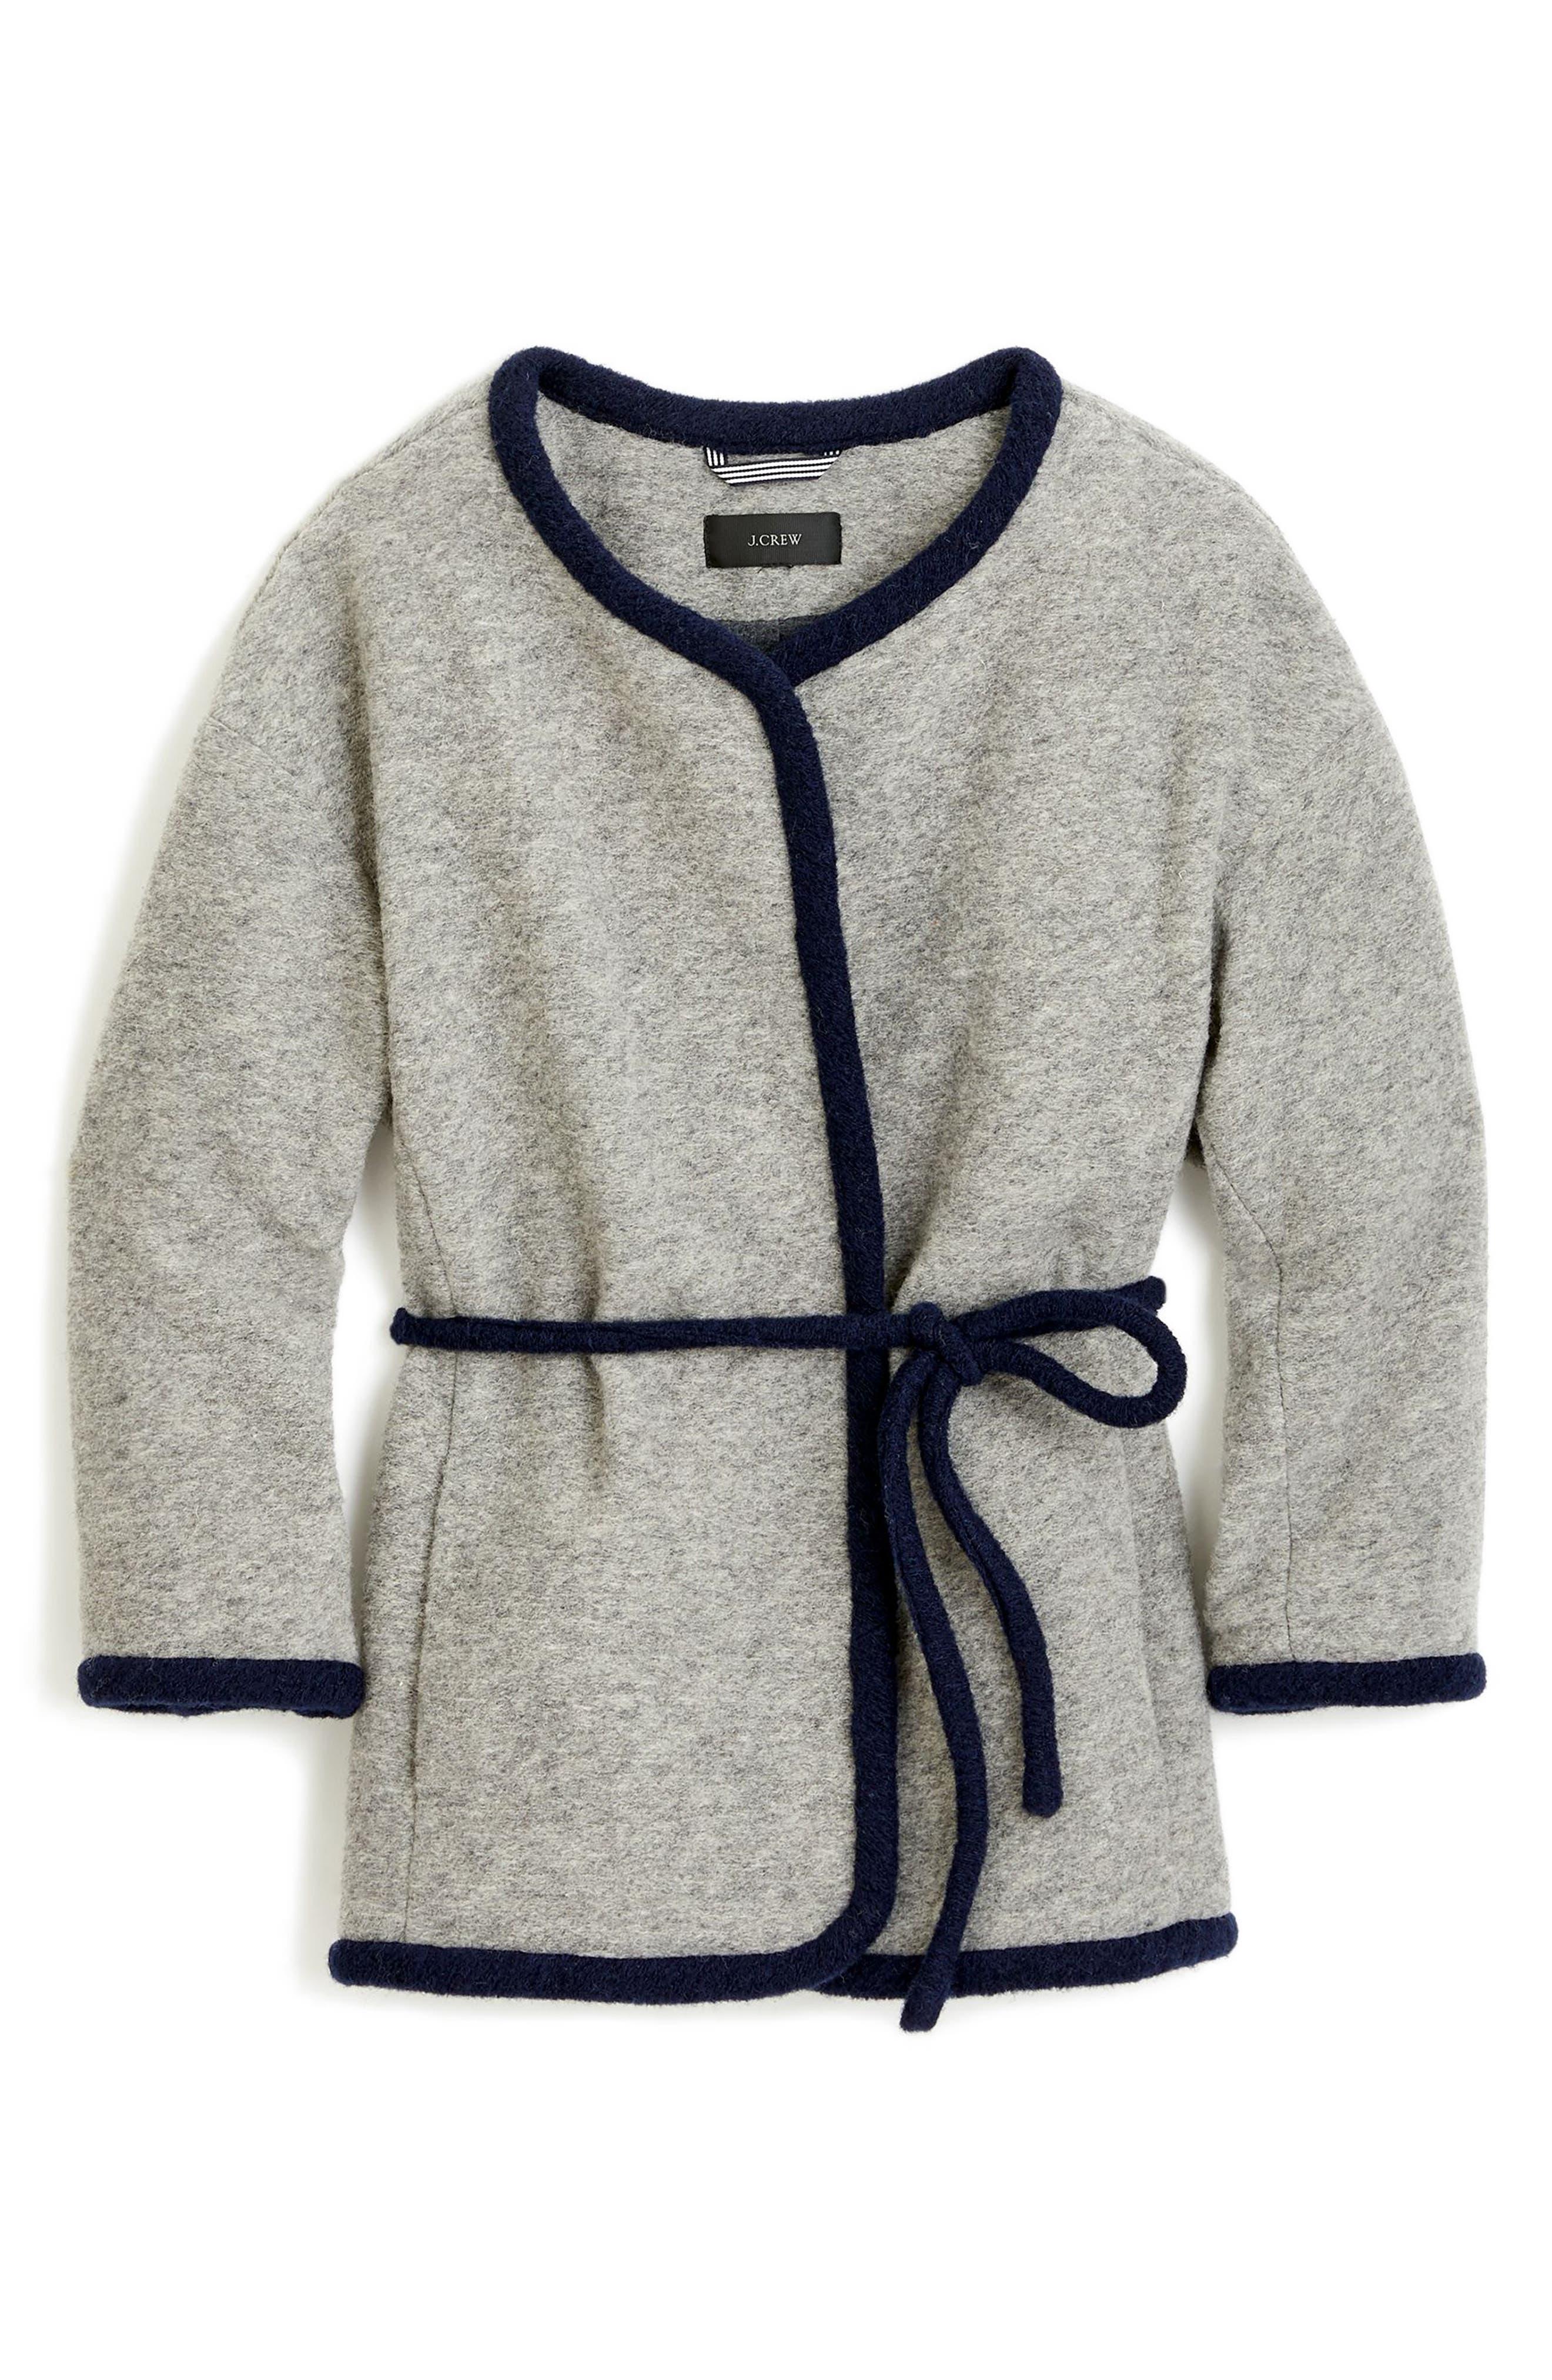 Branford Boiled Wool Blend Jacket,                             Alternate thumbnail 3, color,                             Heather Graphite